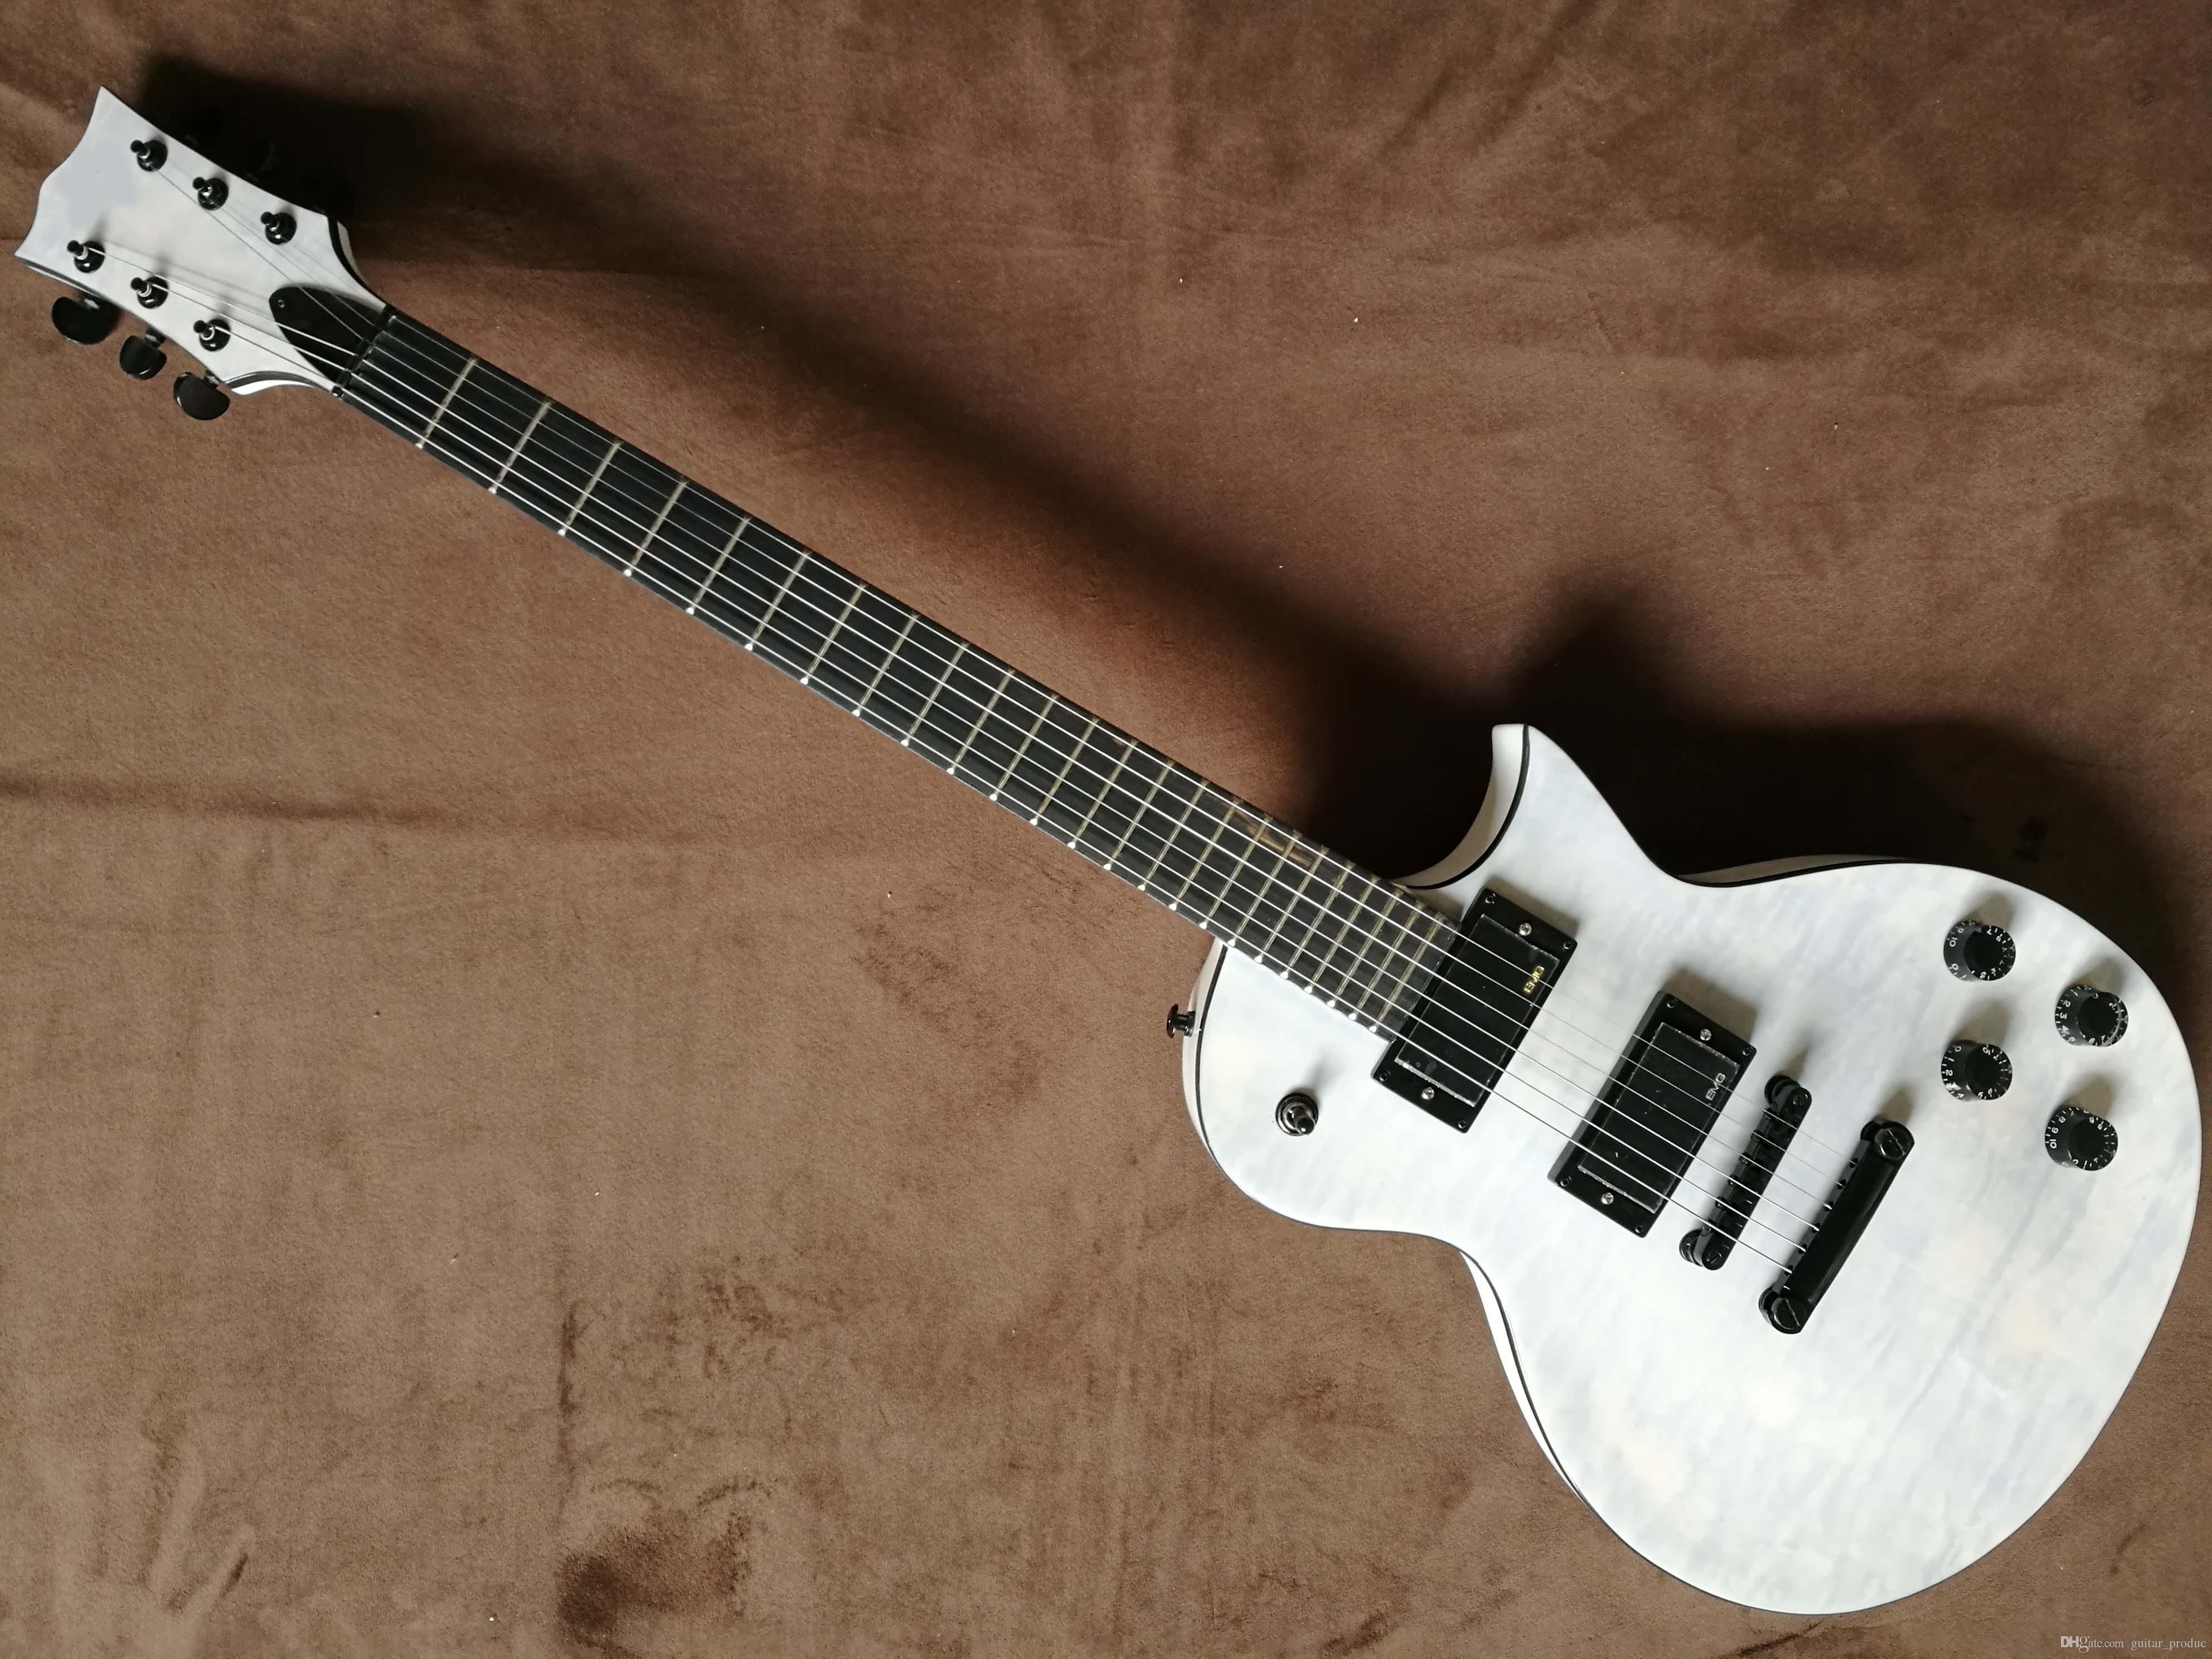 telecaster guitars for sale guitars electric chinese guitars 2015stratocaster left handed. Black Bedroom Furniture Sets. Home Design Ideas